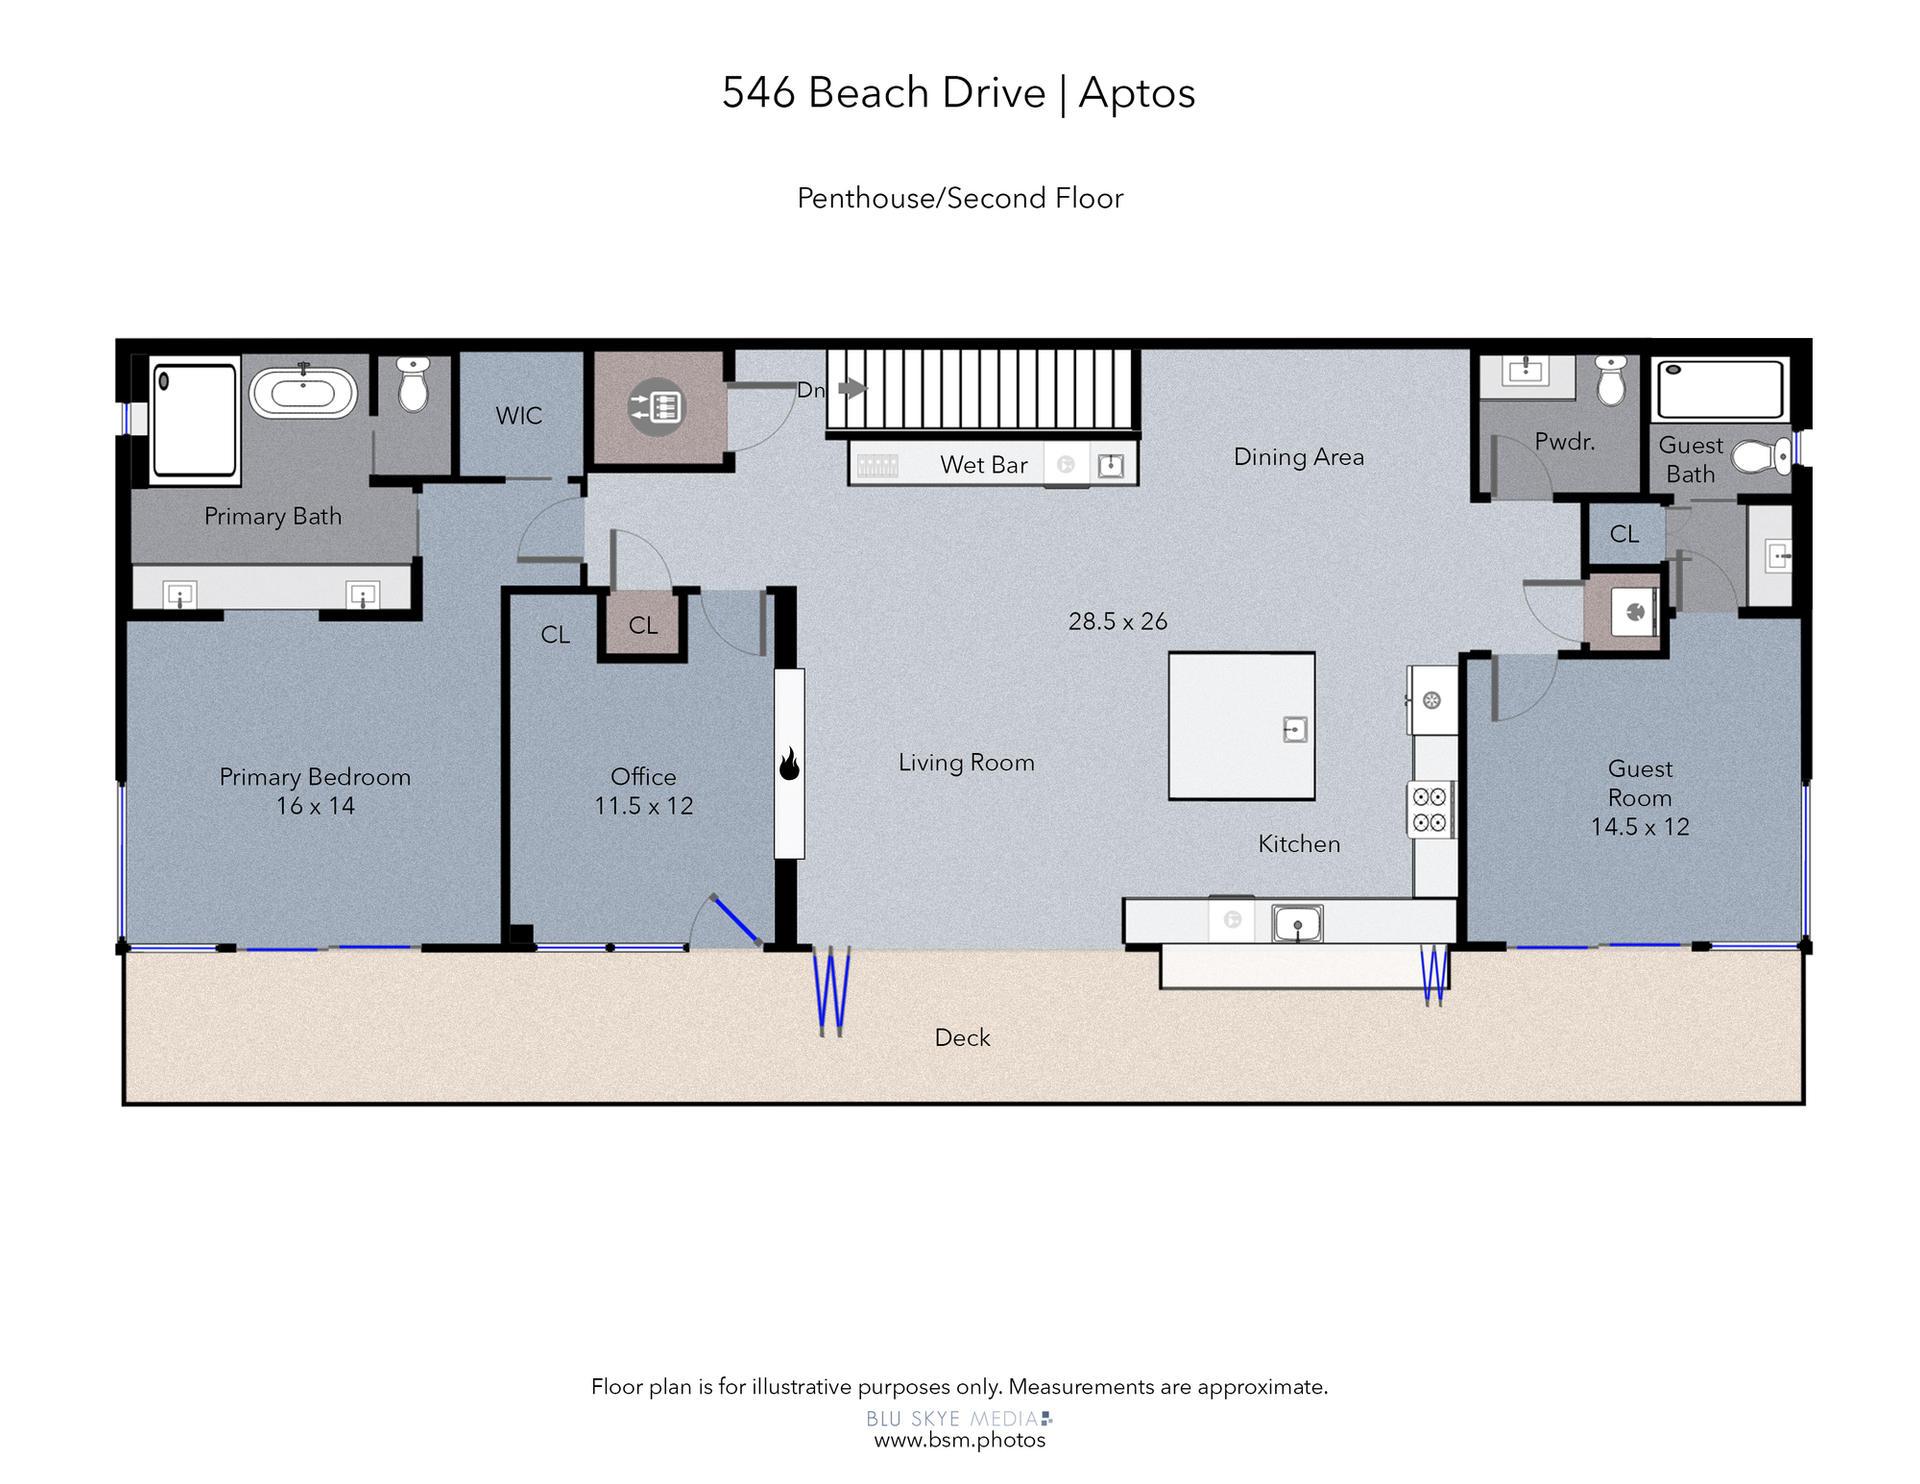 2nd Floor Penthouse